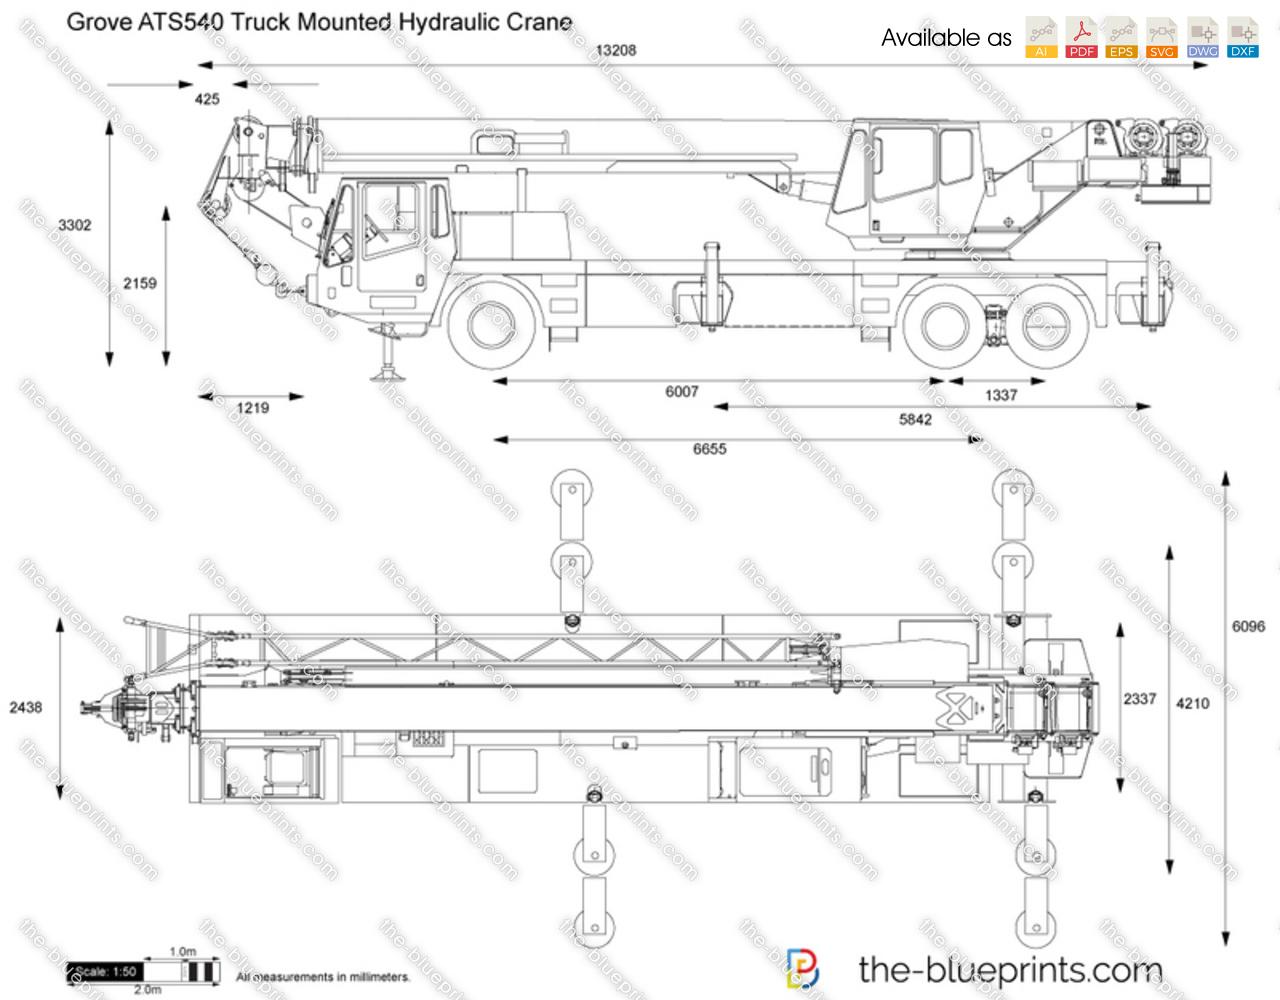 Grove ATS540 Truck Mounted Hydraulic Crane